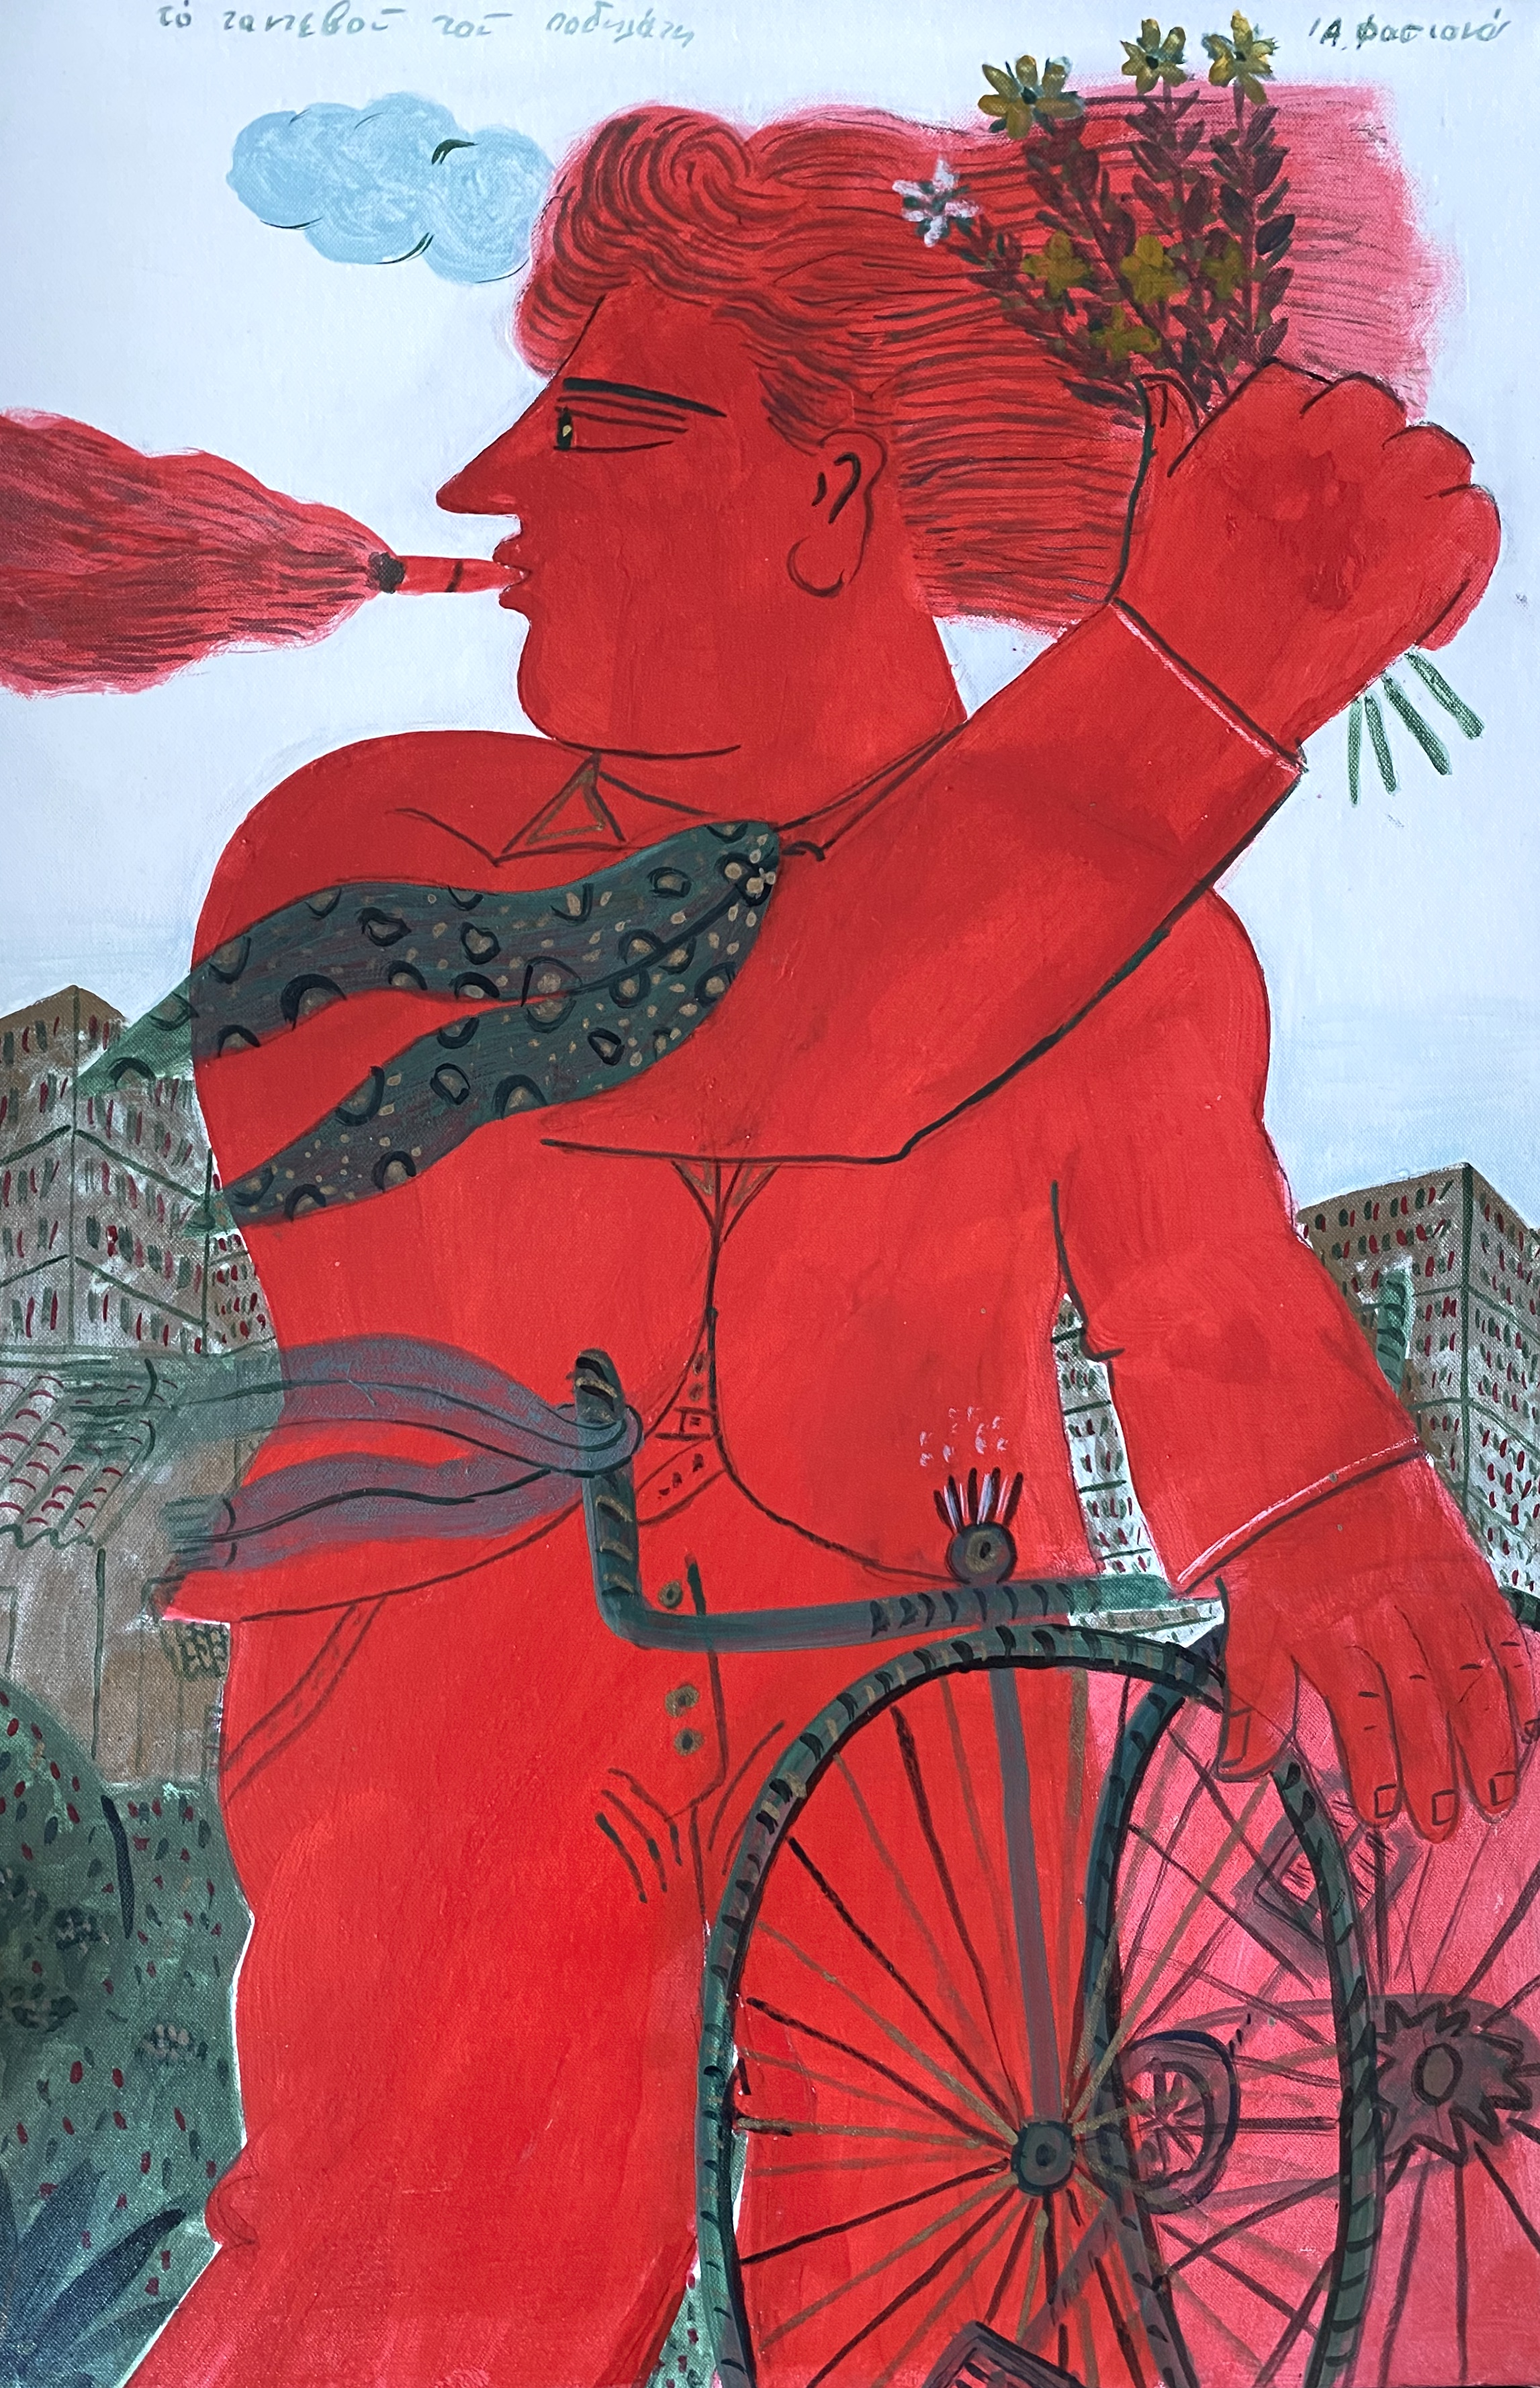 Alekos Fassianos (Greek, born 1935) (AR), The Cyclist's Rendezvous, 74 x 49 cm